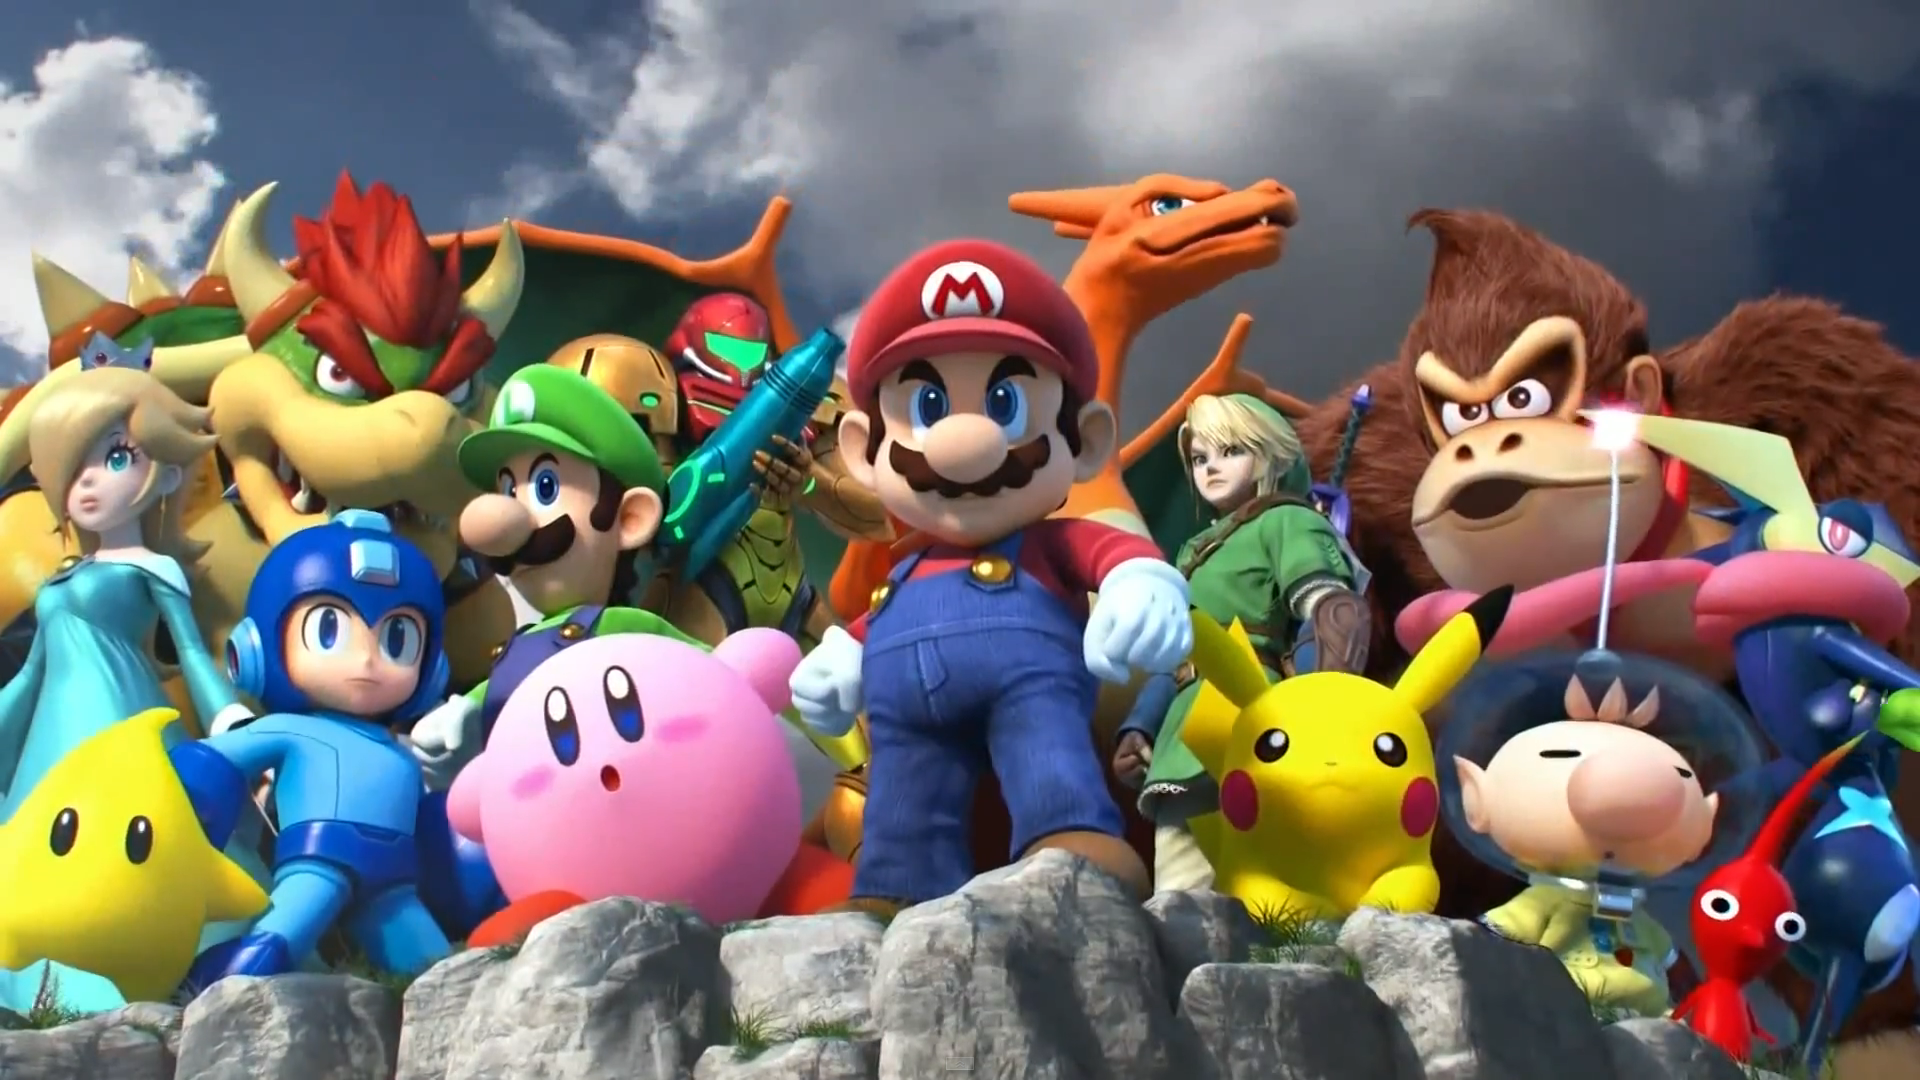 Super Smash Bros 3Ds Commercial Wallpaper